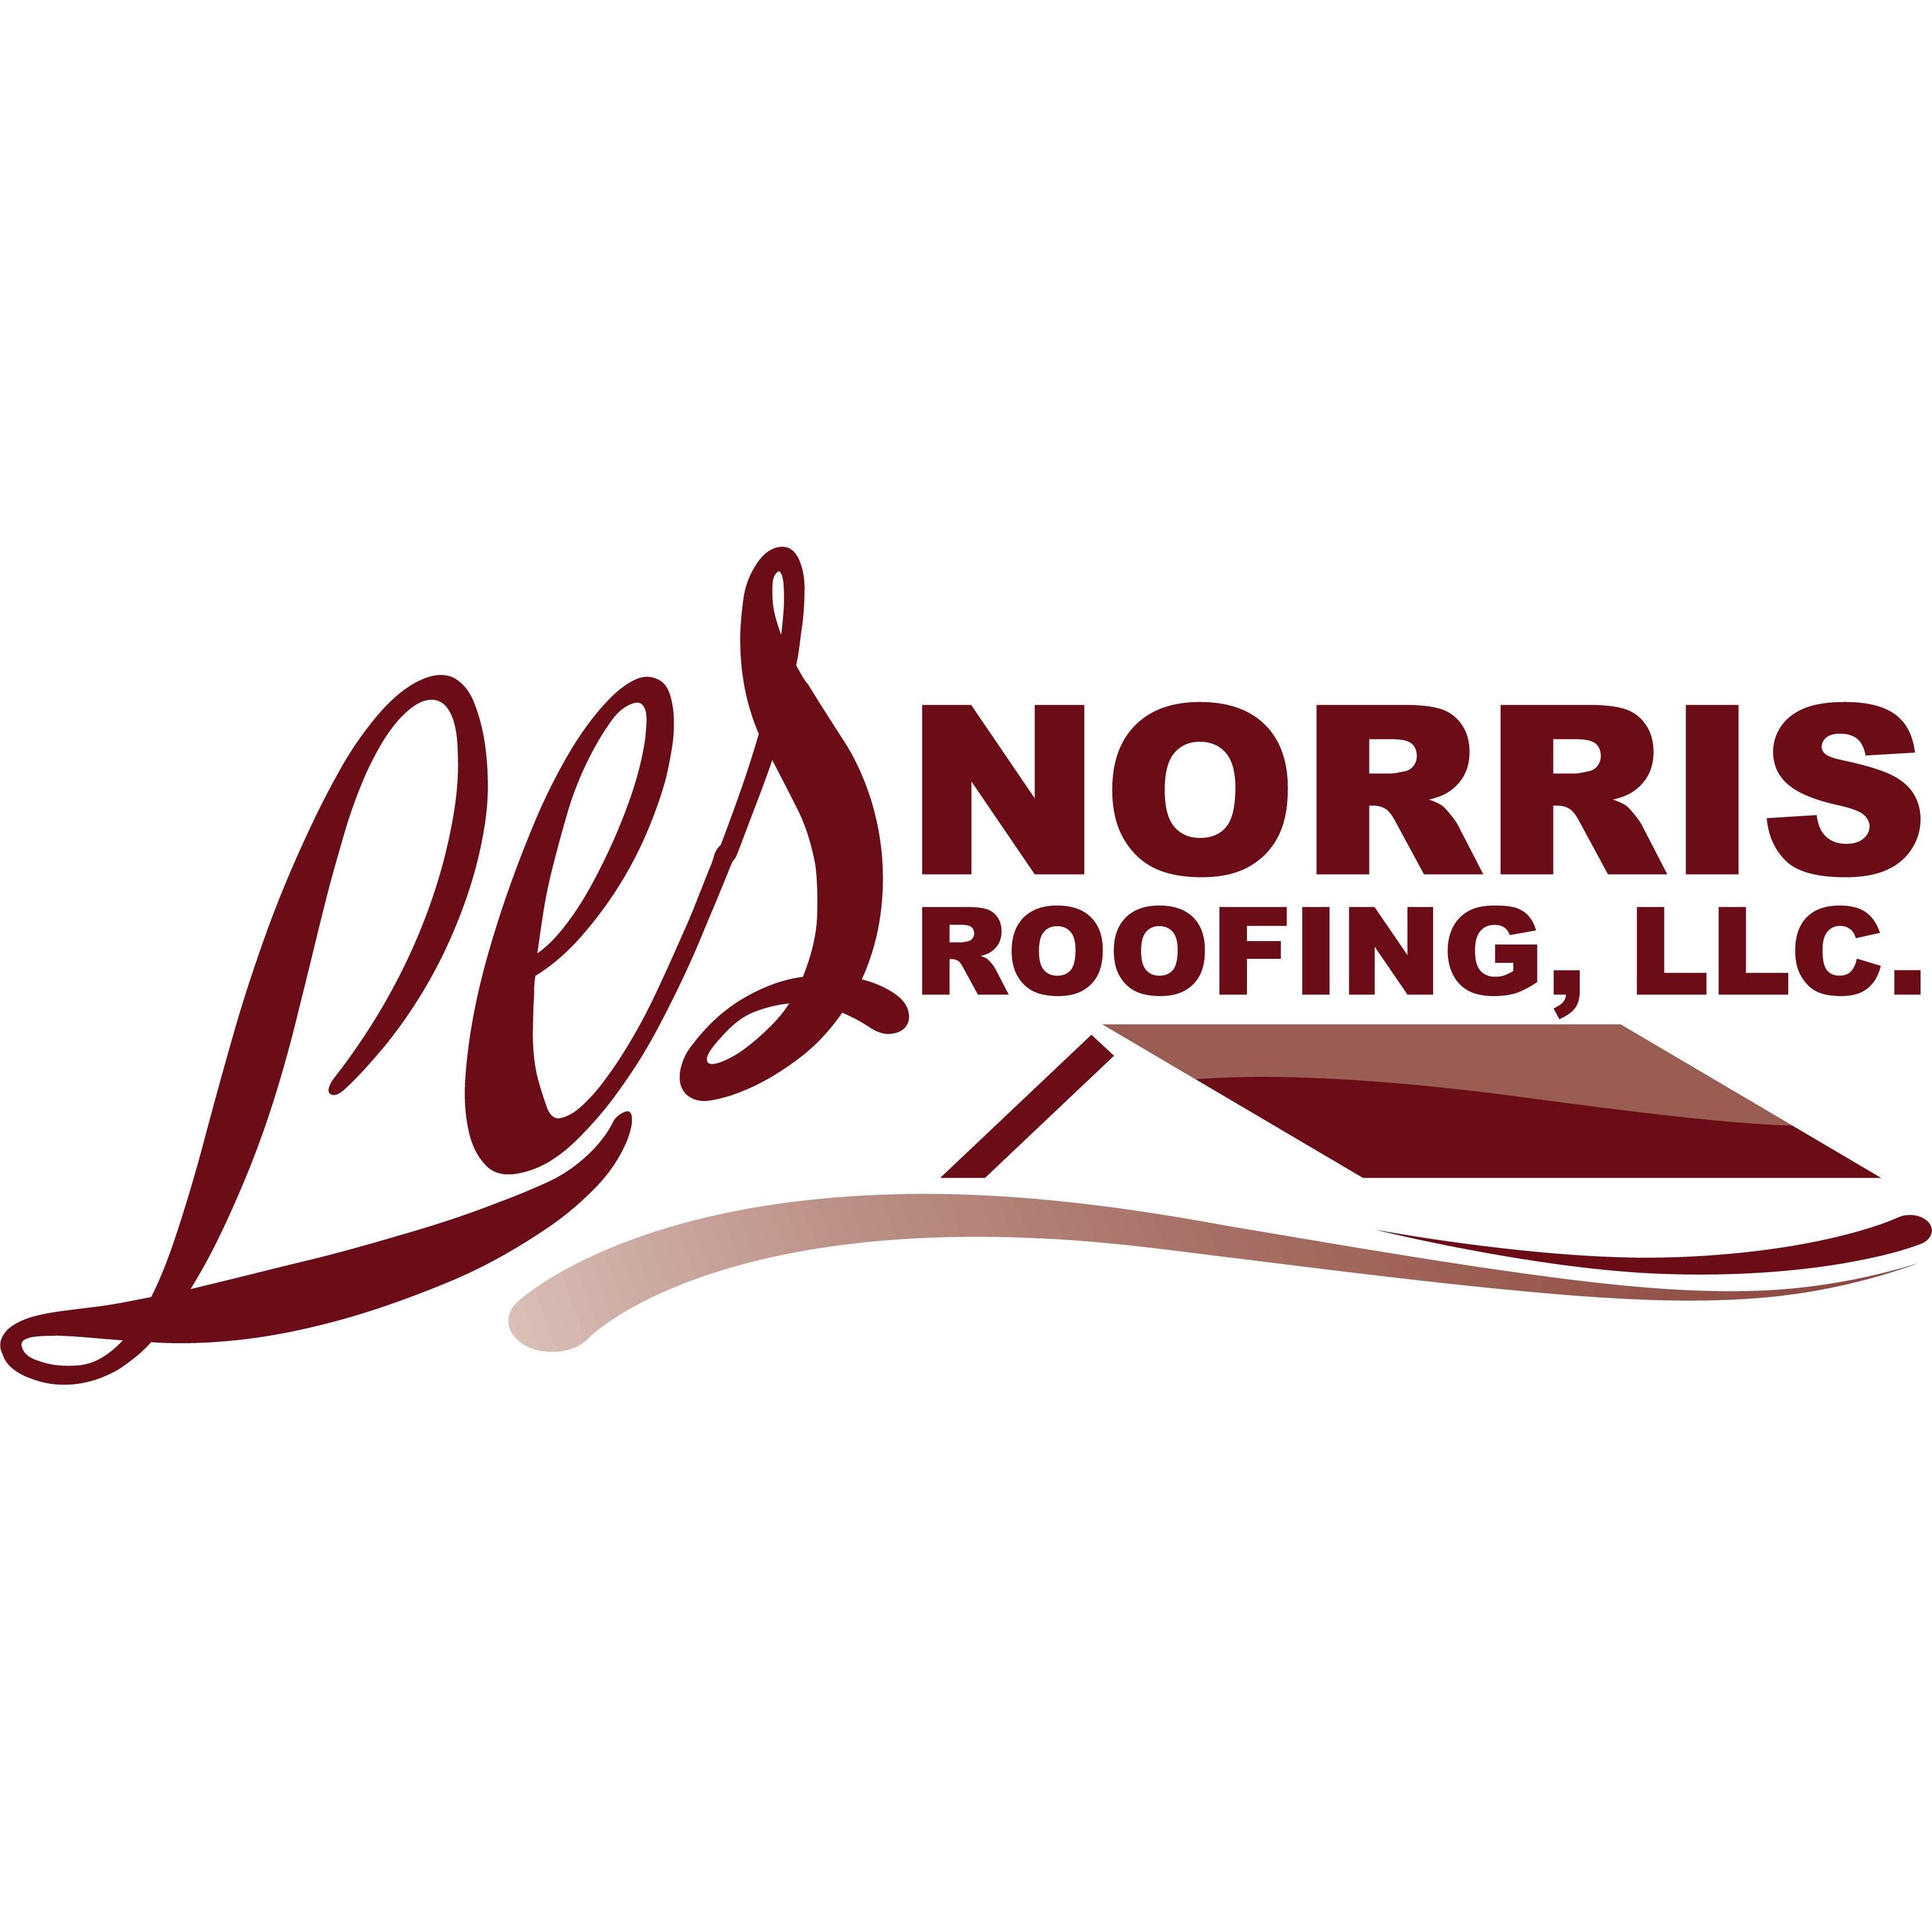 Les Norris Roofing LLC image 0